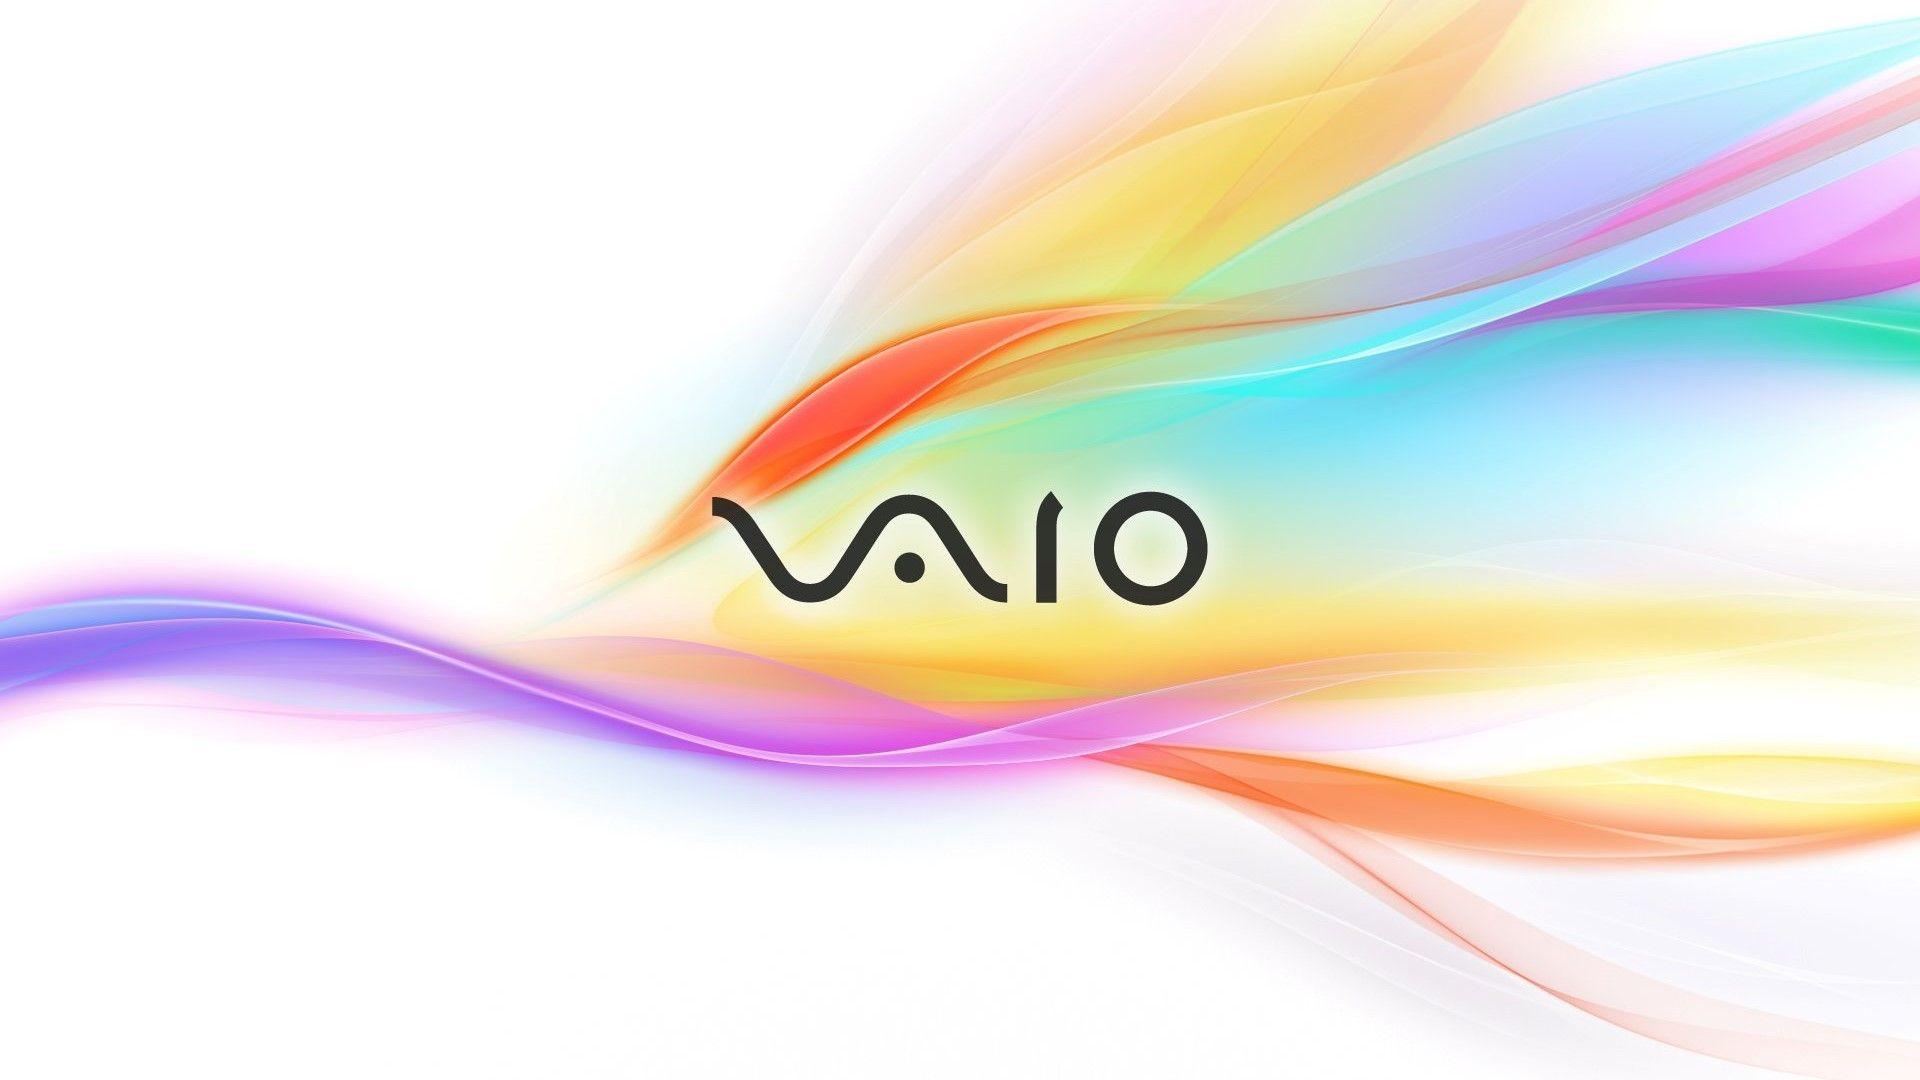 Download wallpaper x sony vaio symbol computer waves for Sfondi vaio